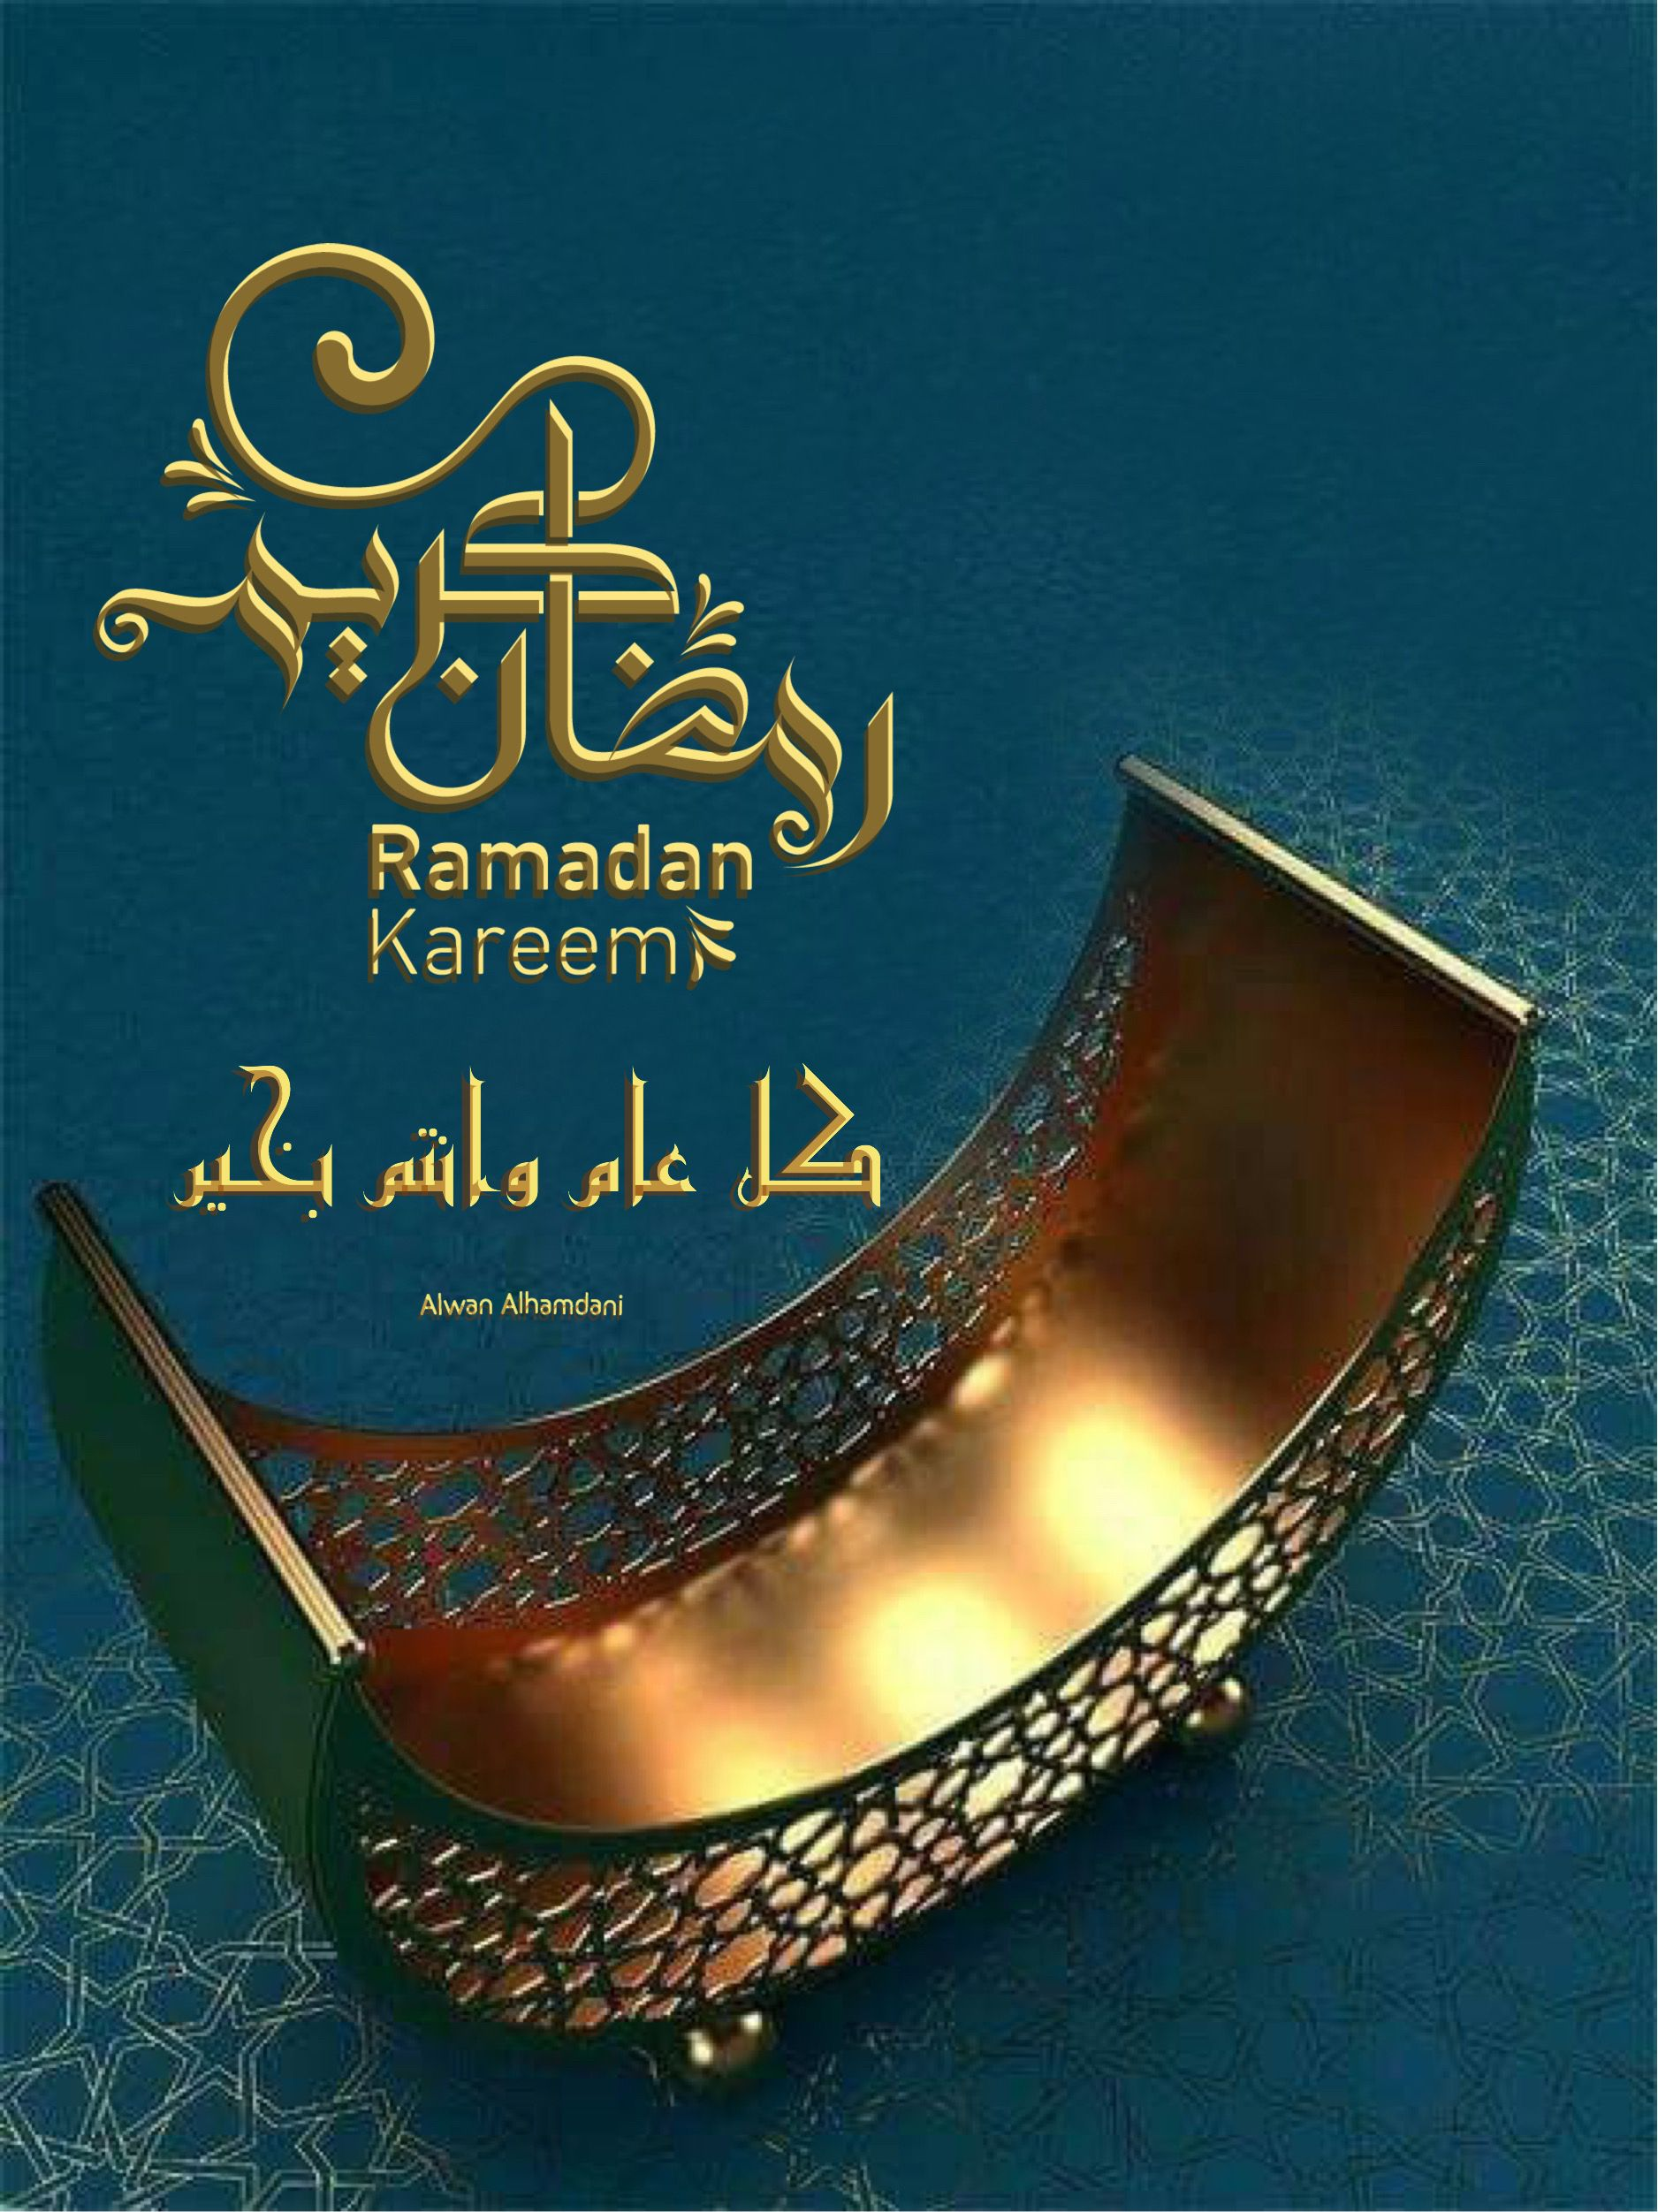 Pin By Luma Sufyar On Ramadaniyat In 2021 Ramadan Greetings Happy Ramadan Mubarak Islamic Caligraphy Art